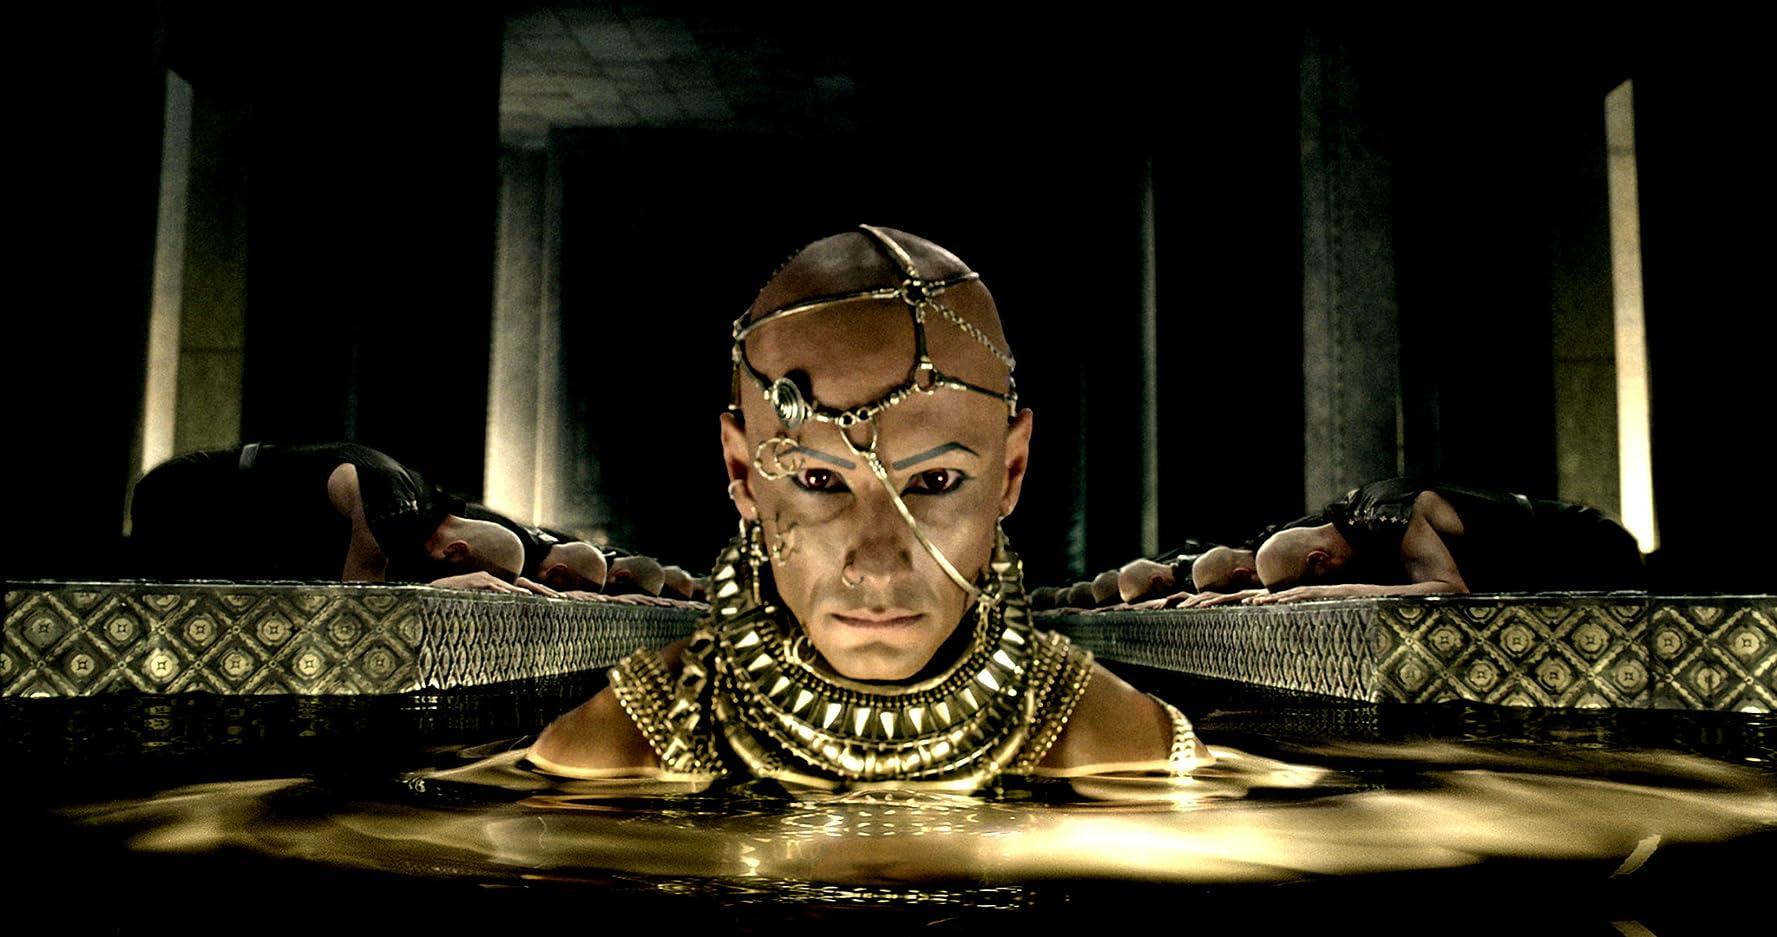 Rodrigo Santoro in 300: Rise of an Empire (2014)